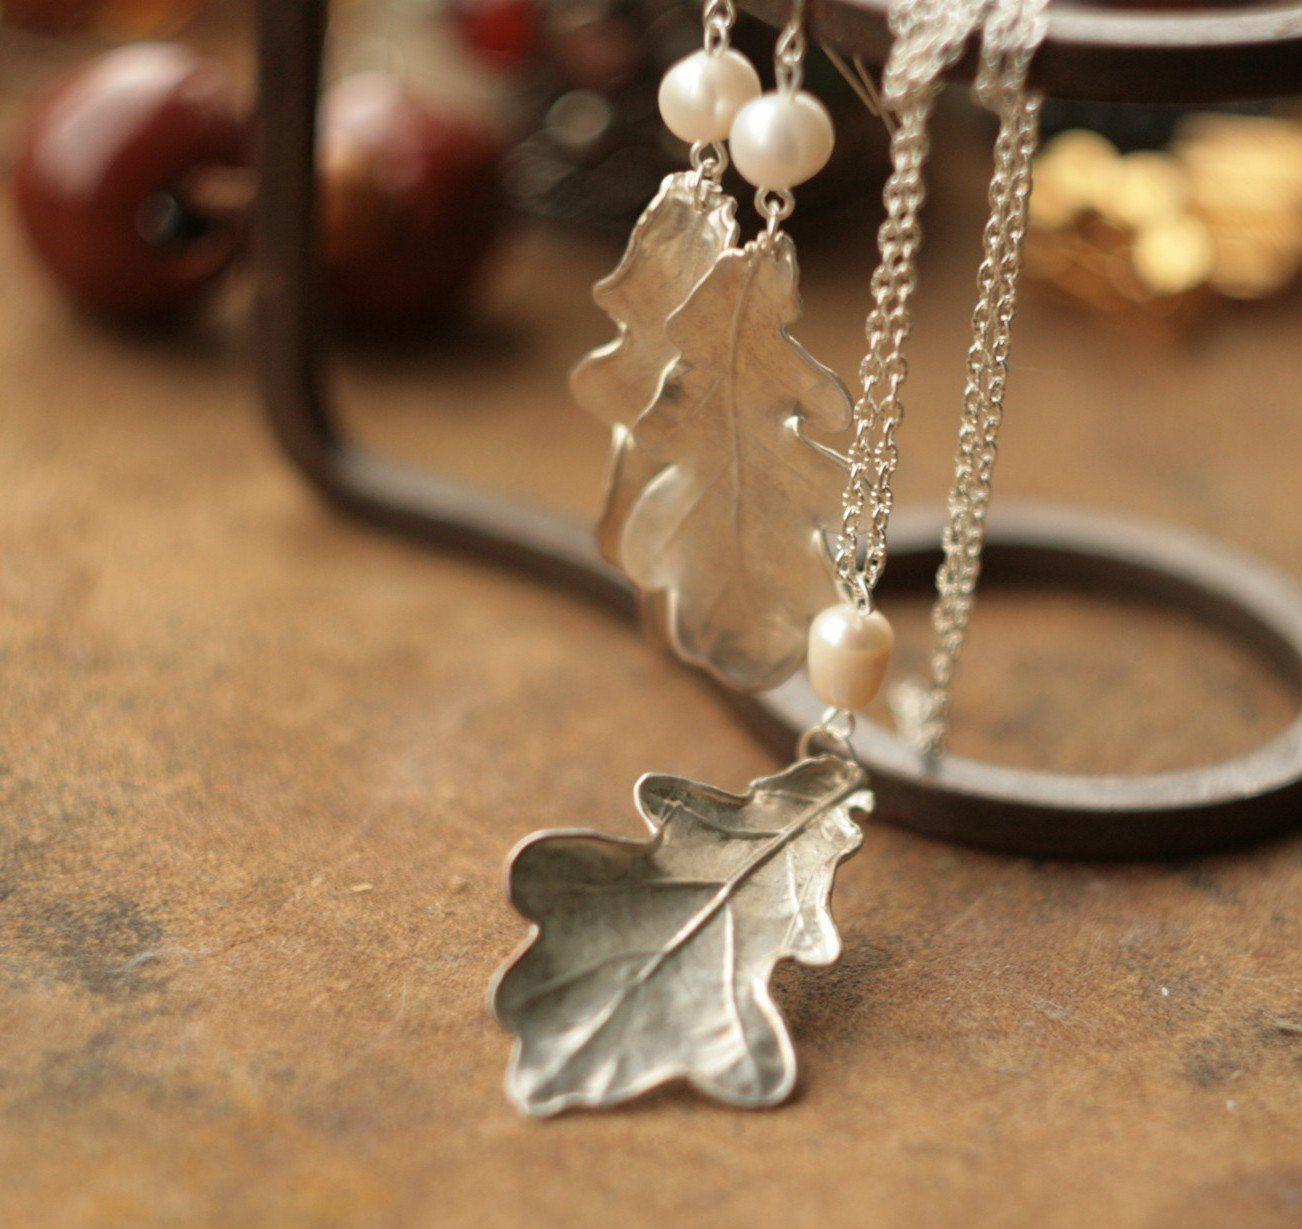 pearls silverplated pendant Silver oak leaves set electroplated electroformed natural leaf elf fairy elven earrings electroforming